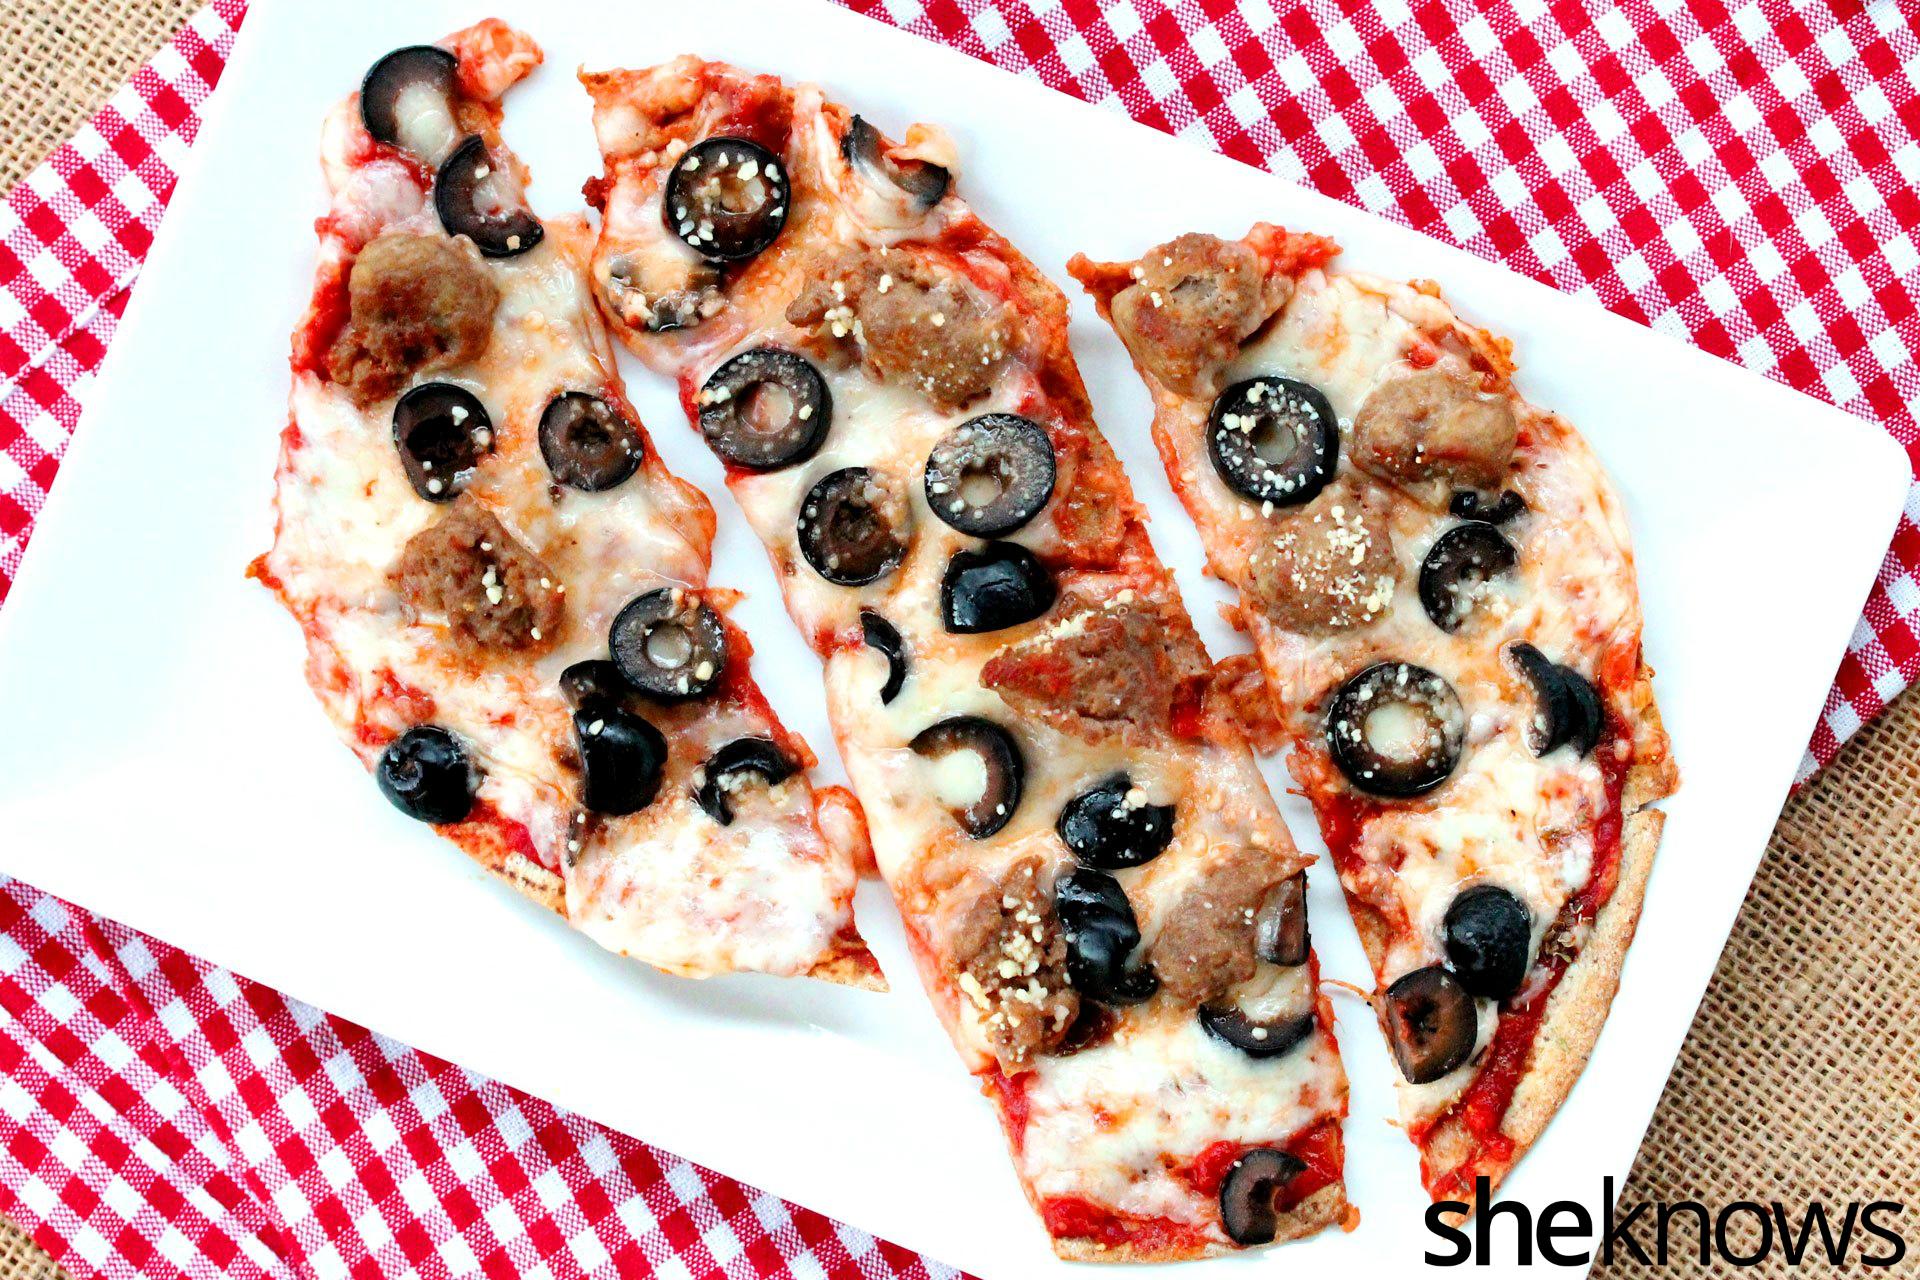 1 flatbread pizza